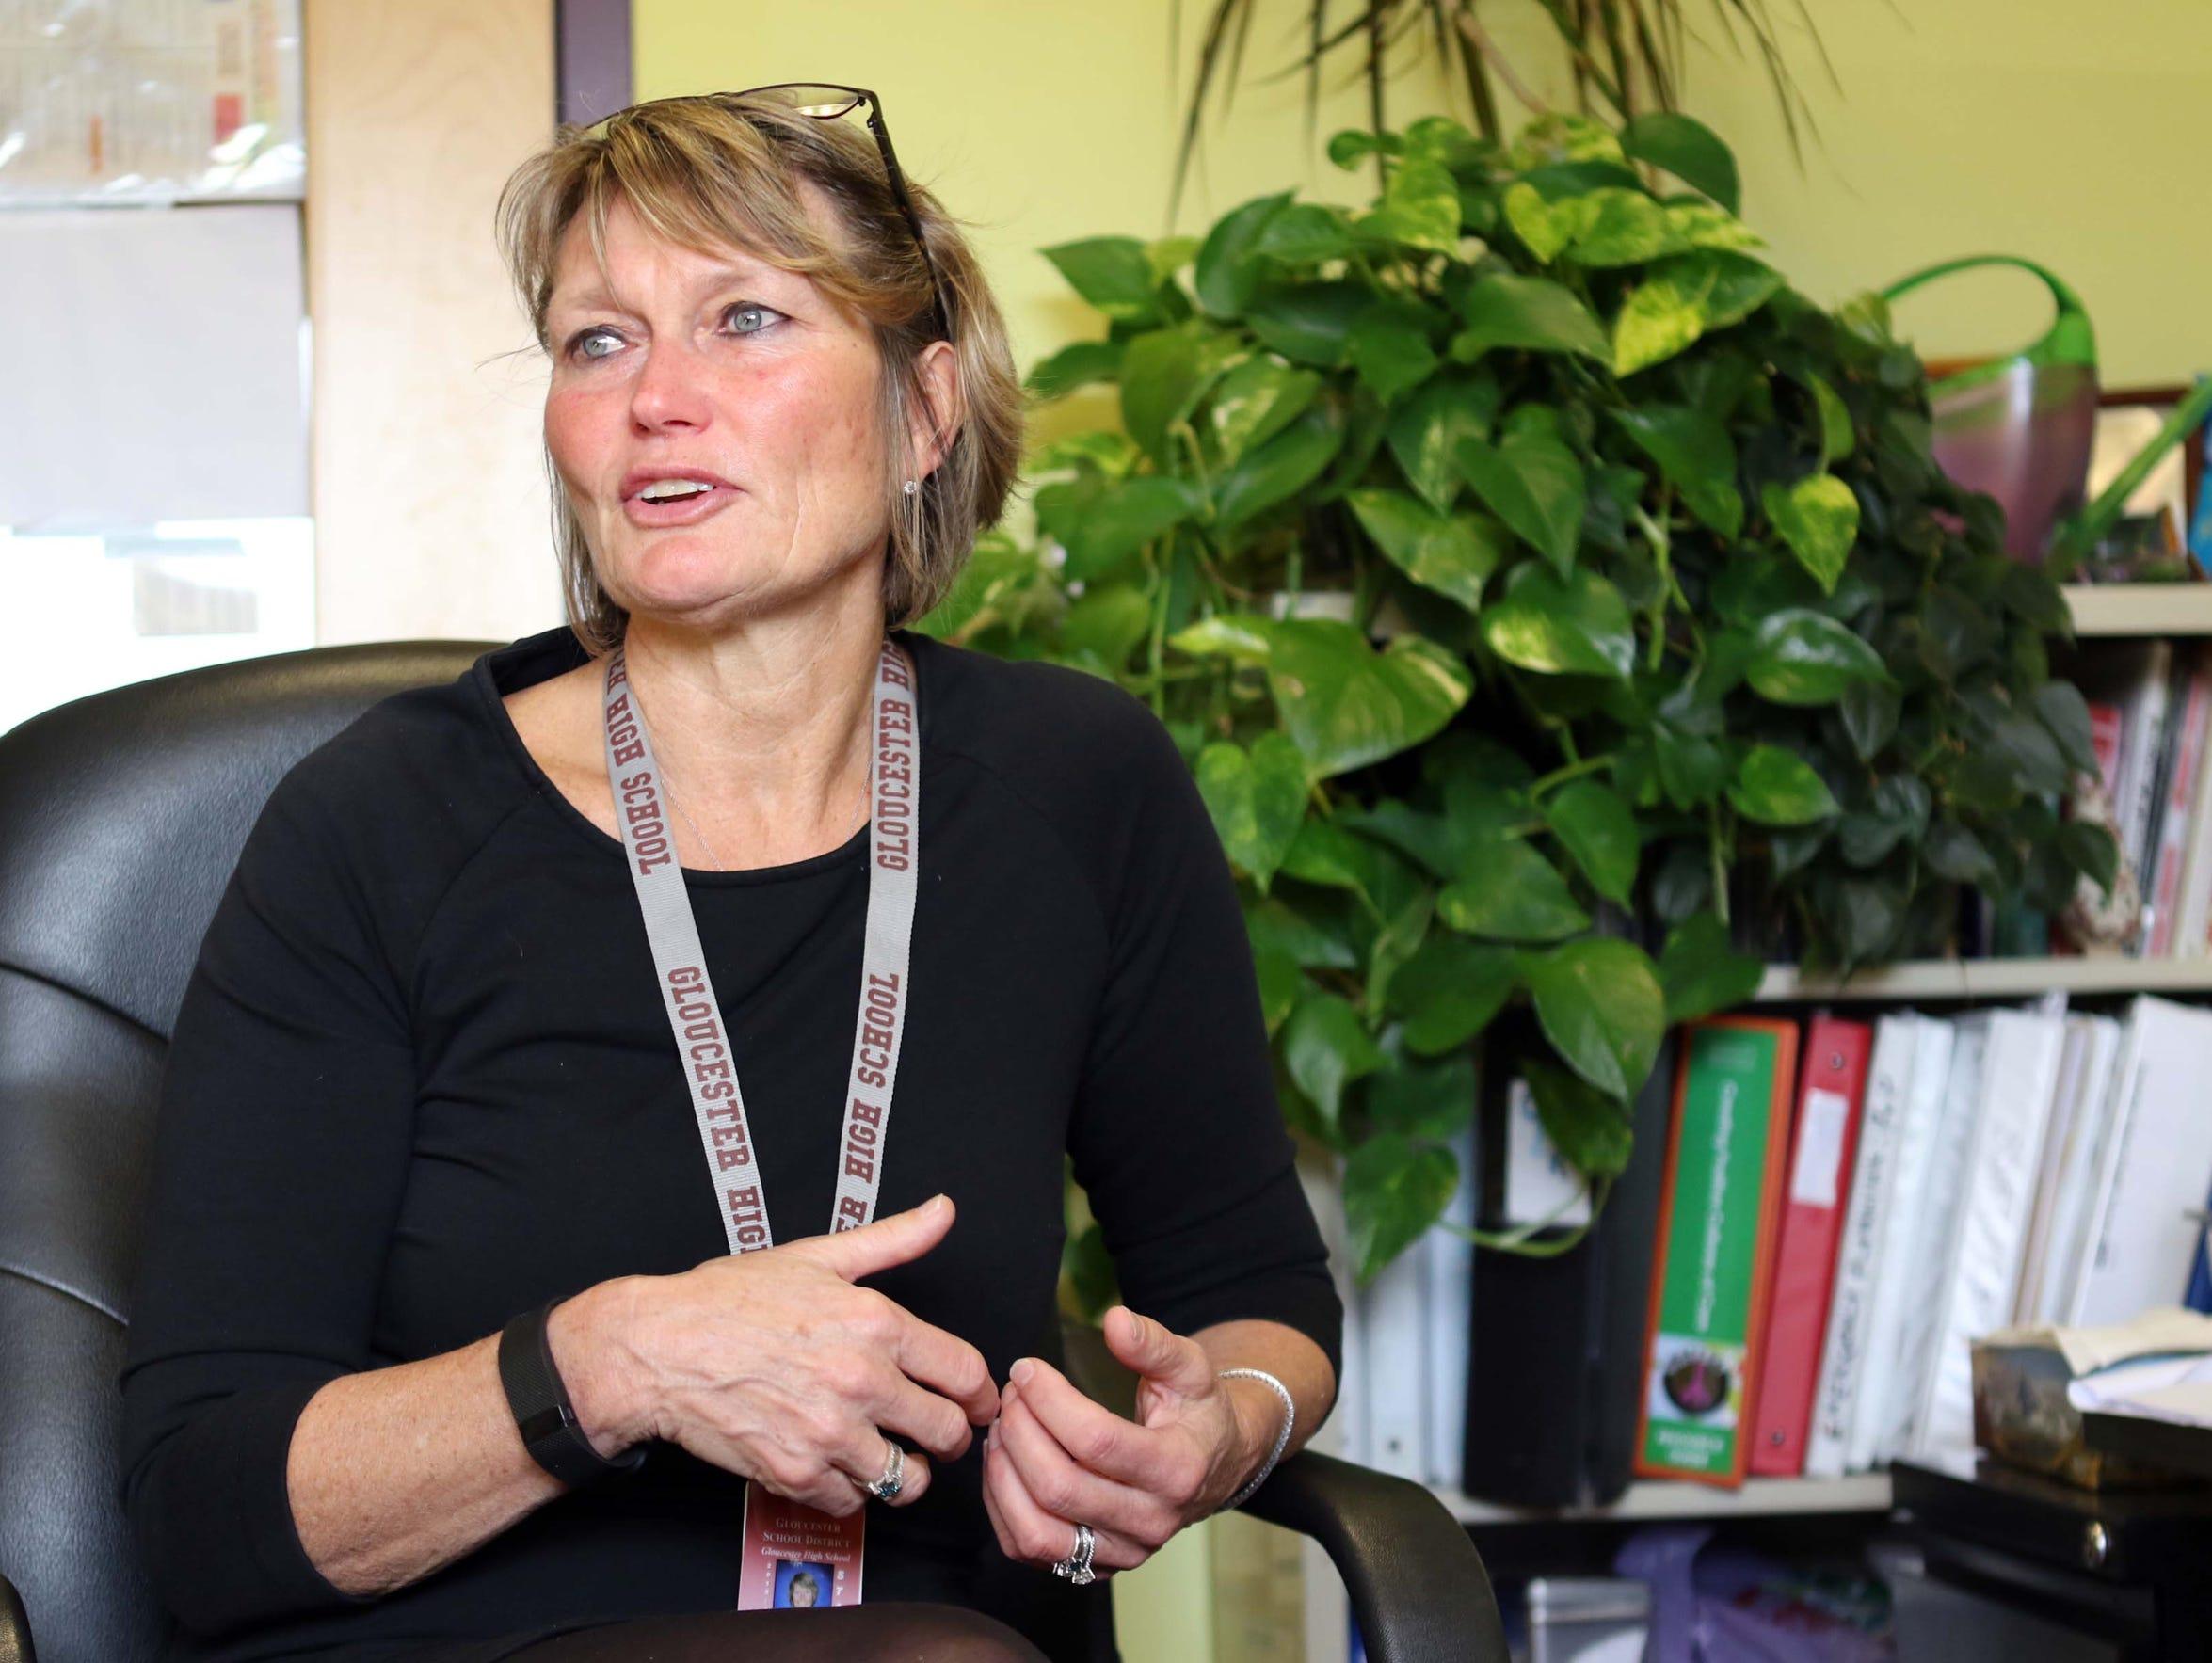 Cindy Juncker, a nurse leader for the Gloucester Public